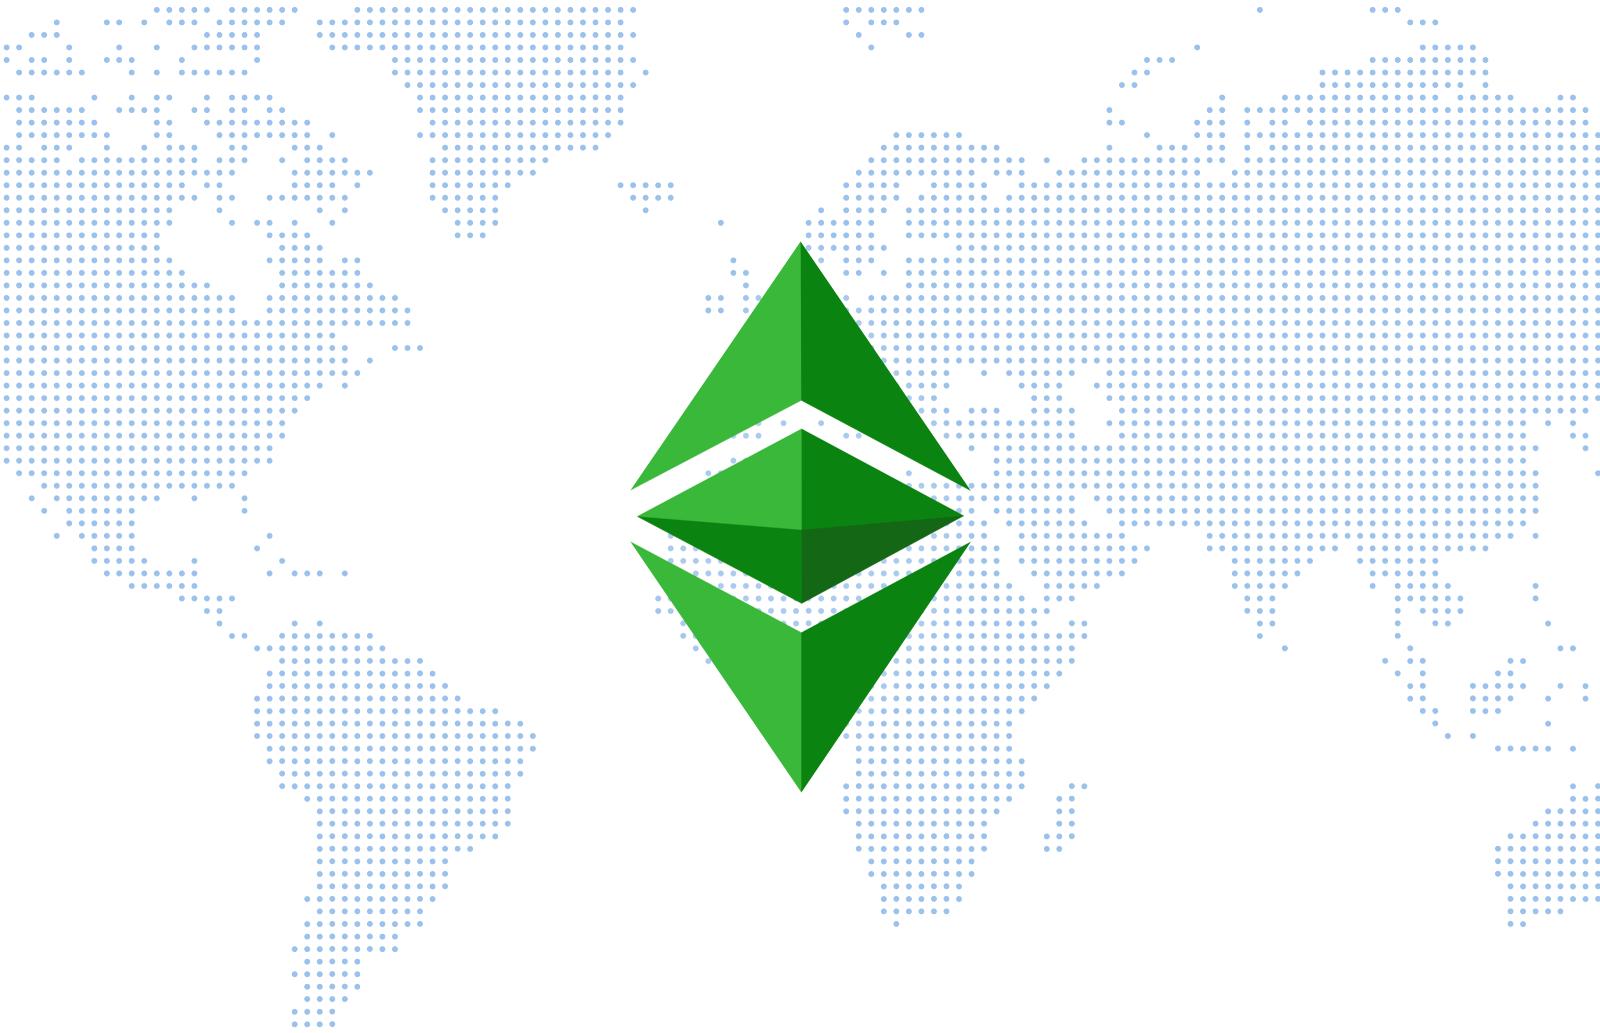 ETC price increase: speculation or more volume?